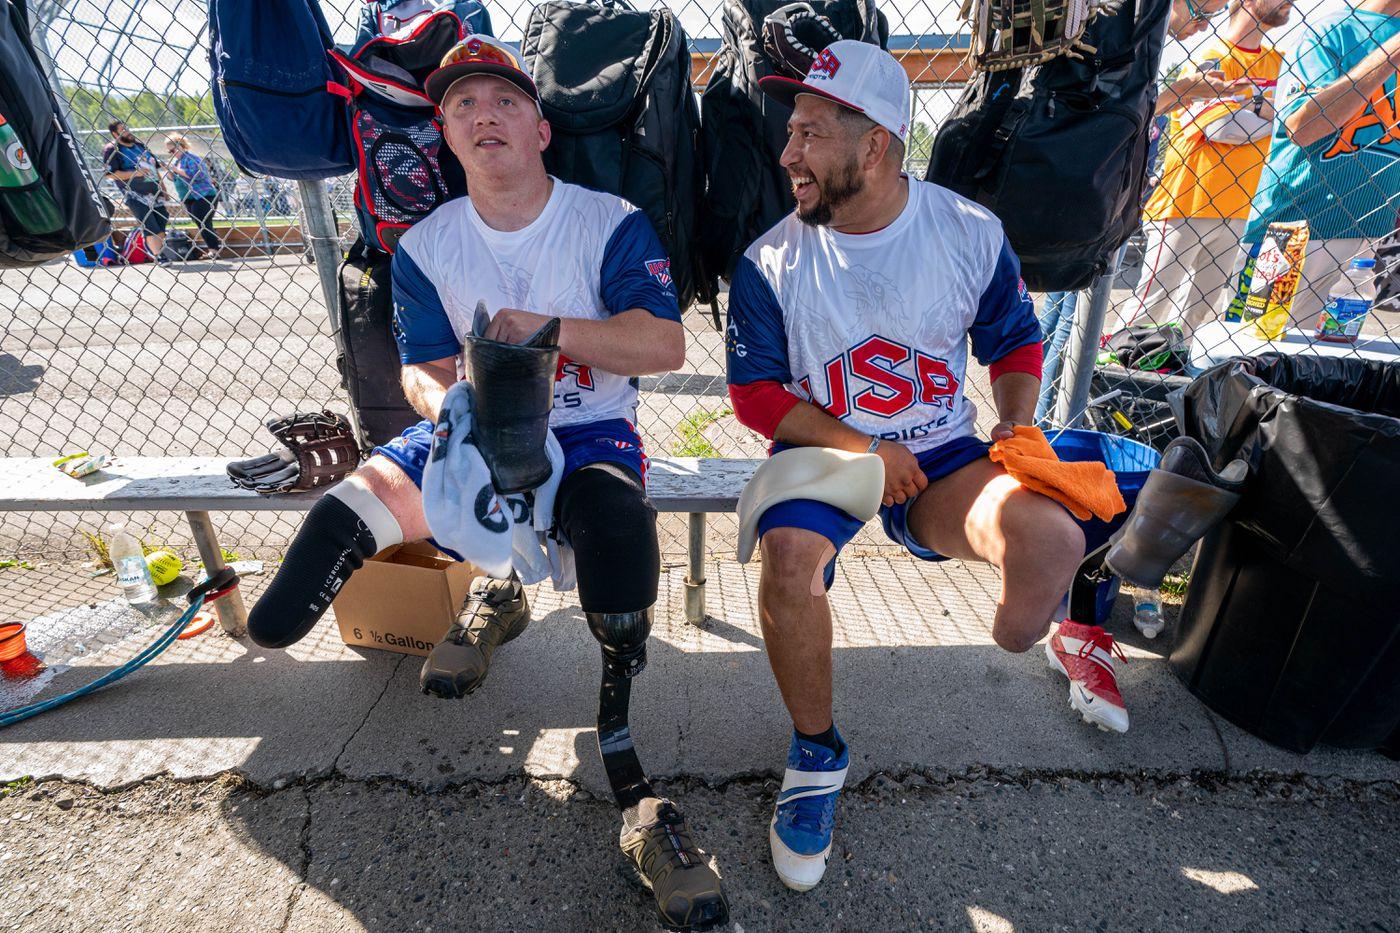 Josh Wege, left, and Saul Monroy adjust their prosthetics during a game. (Loren Holmes / ADN)